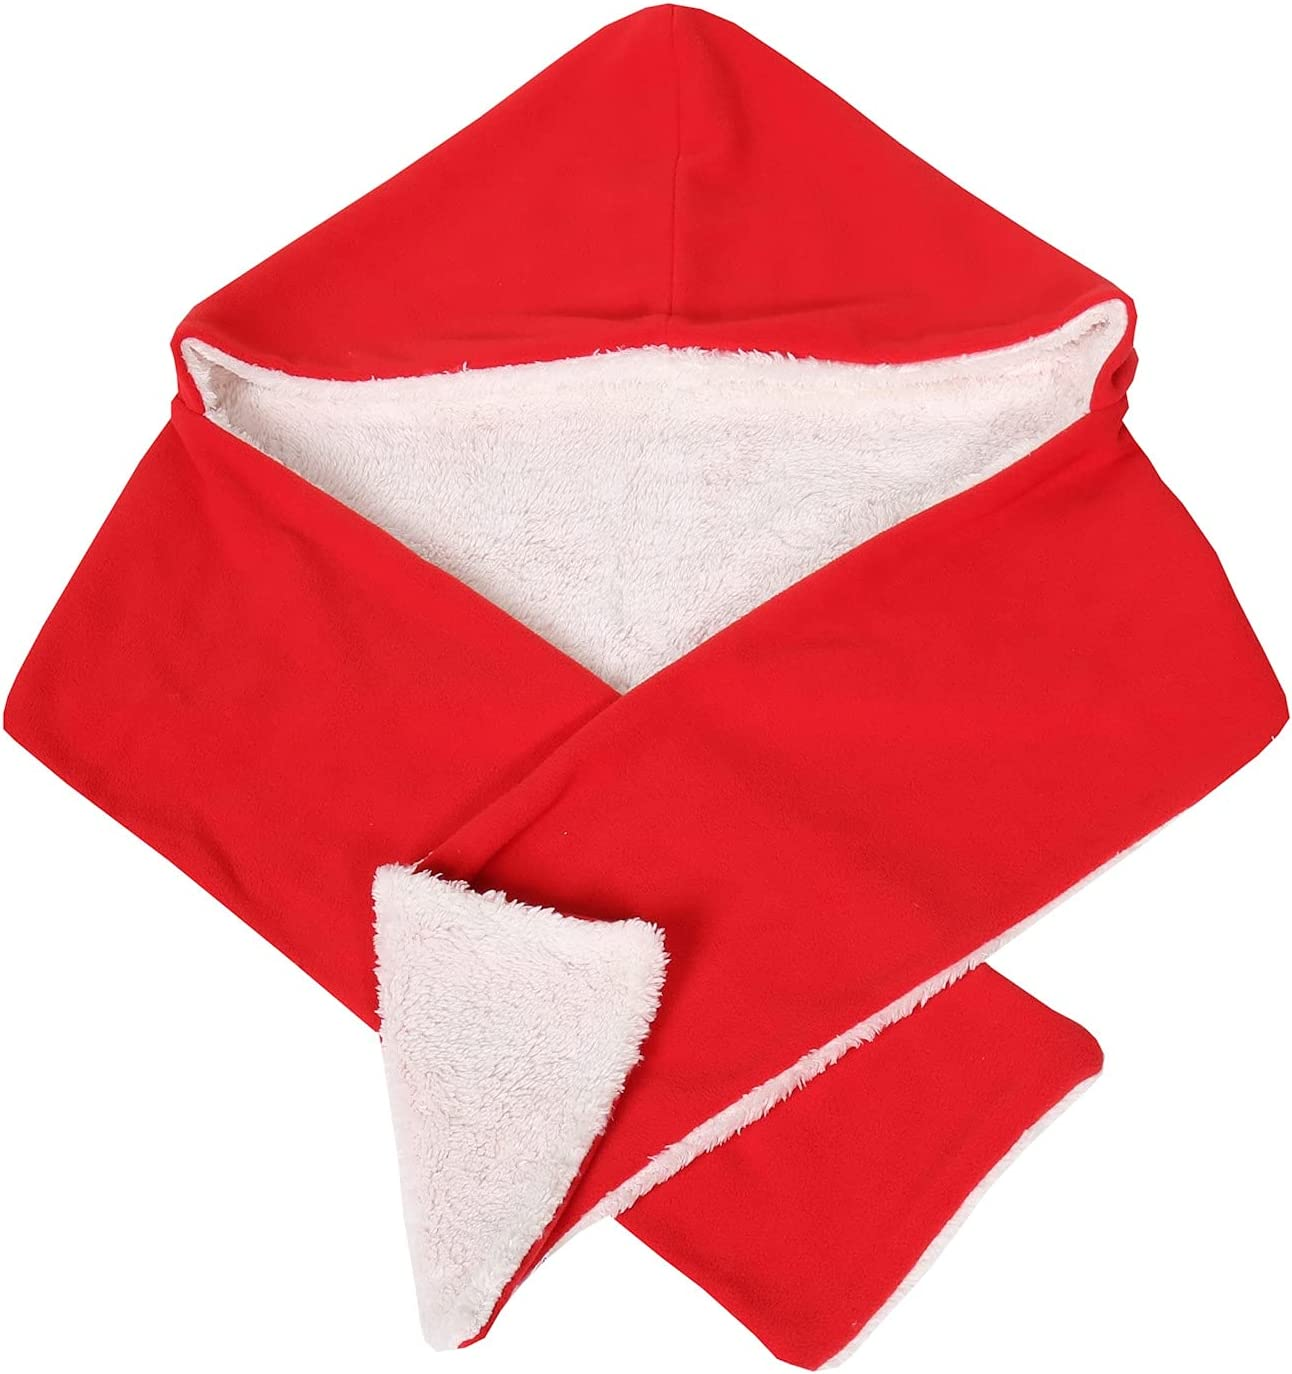 Soft Cozy Warm Fleece Reversible Hooded Wrap Scarf - Red